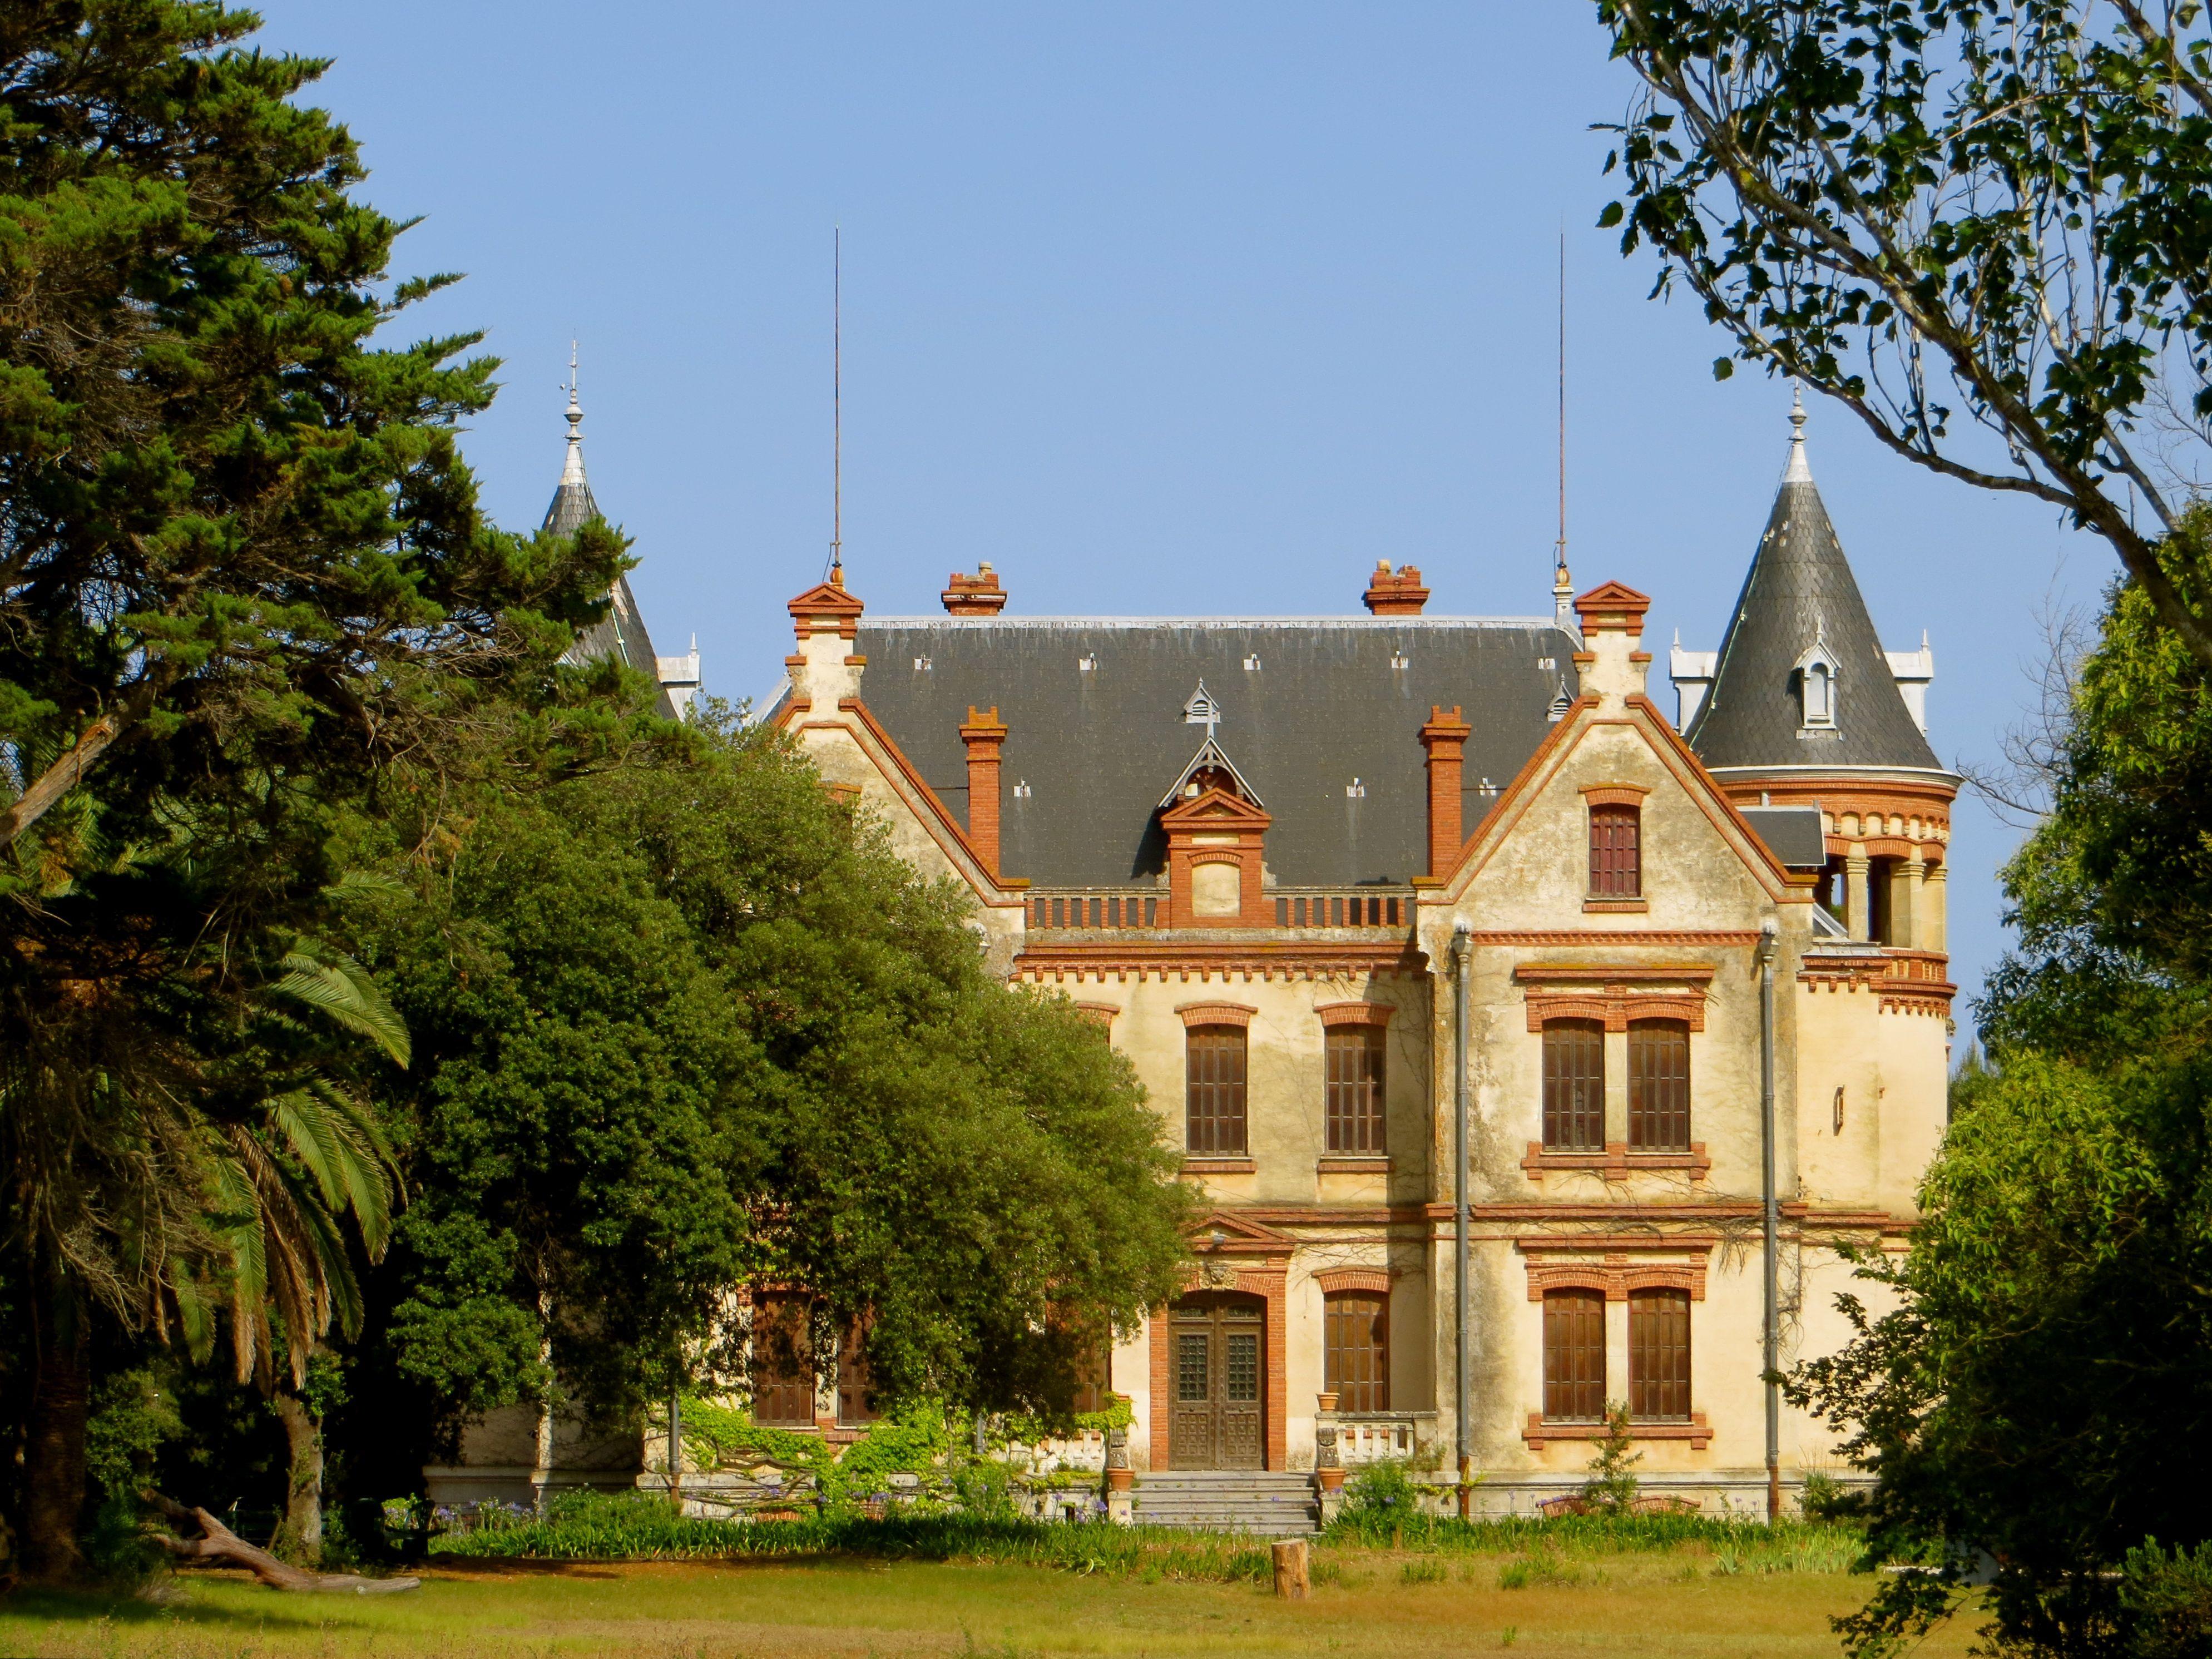 Chateau in Canet-en-Roussillion, France